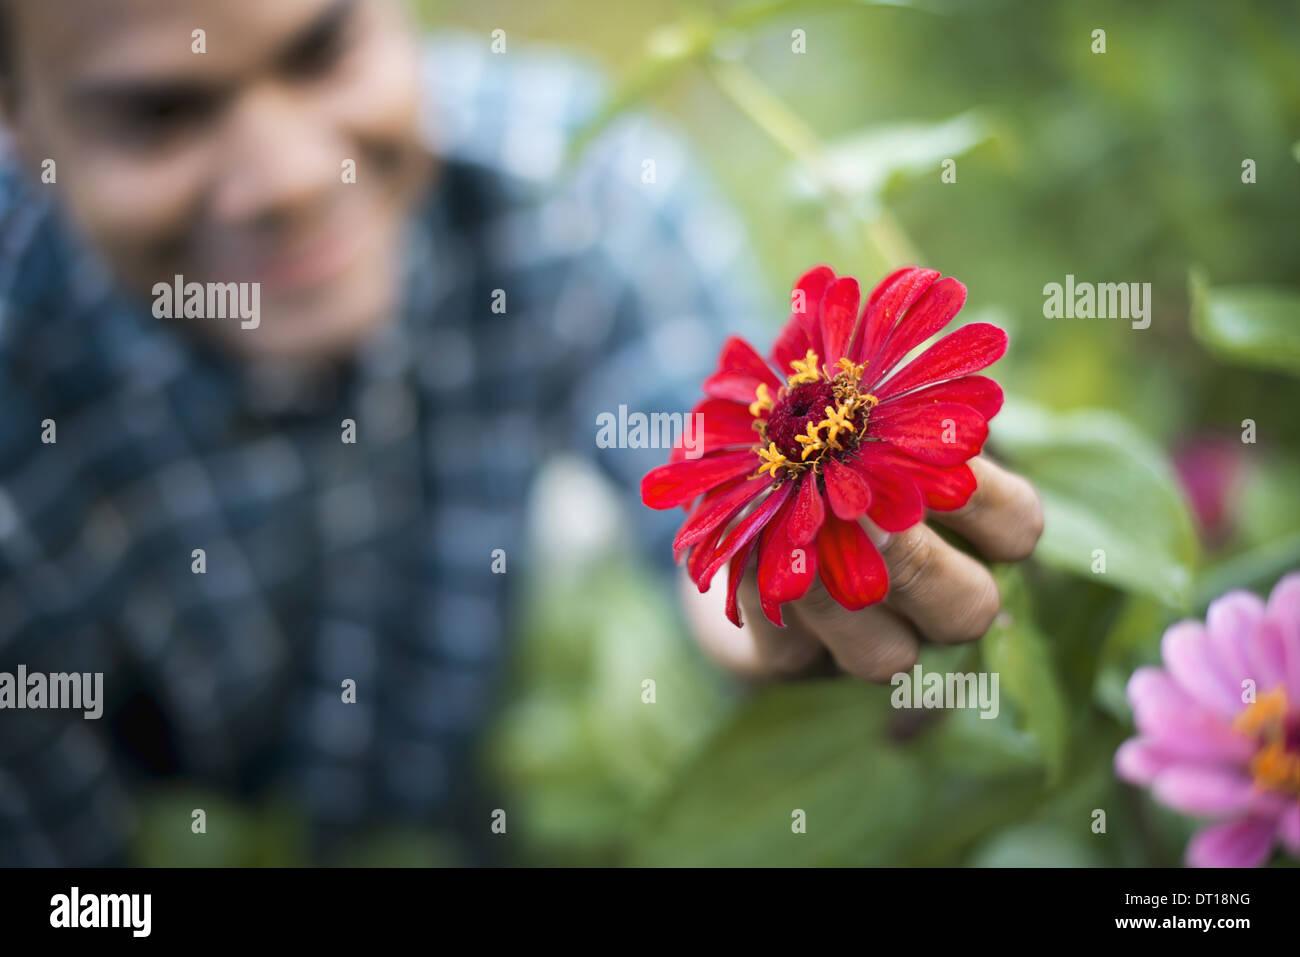 Woodstock New York USA man field of flowers holds red petalled flower - Stock Image